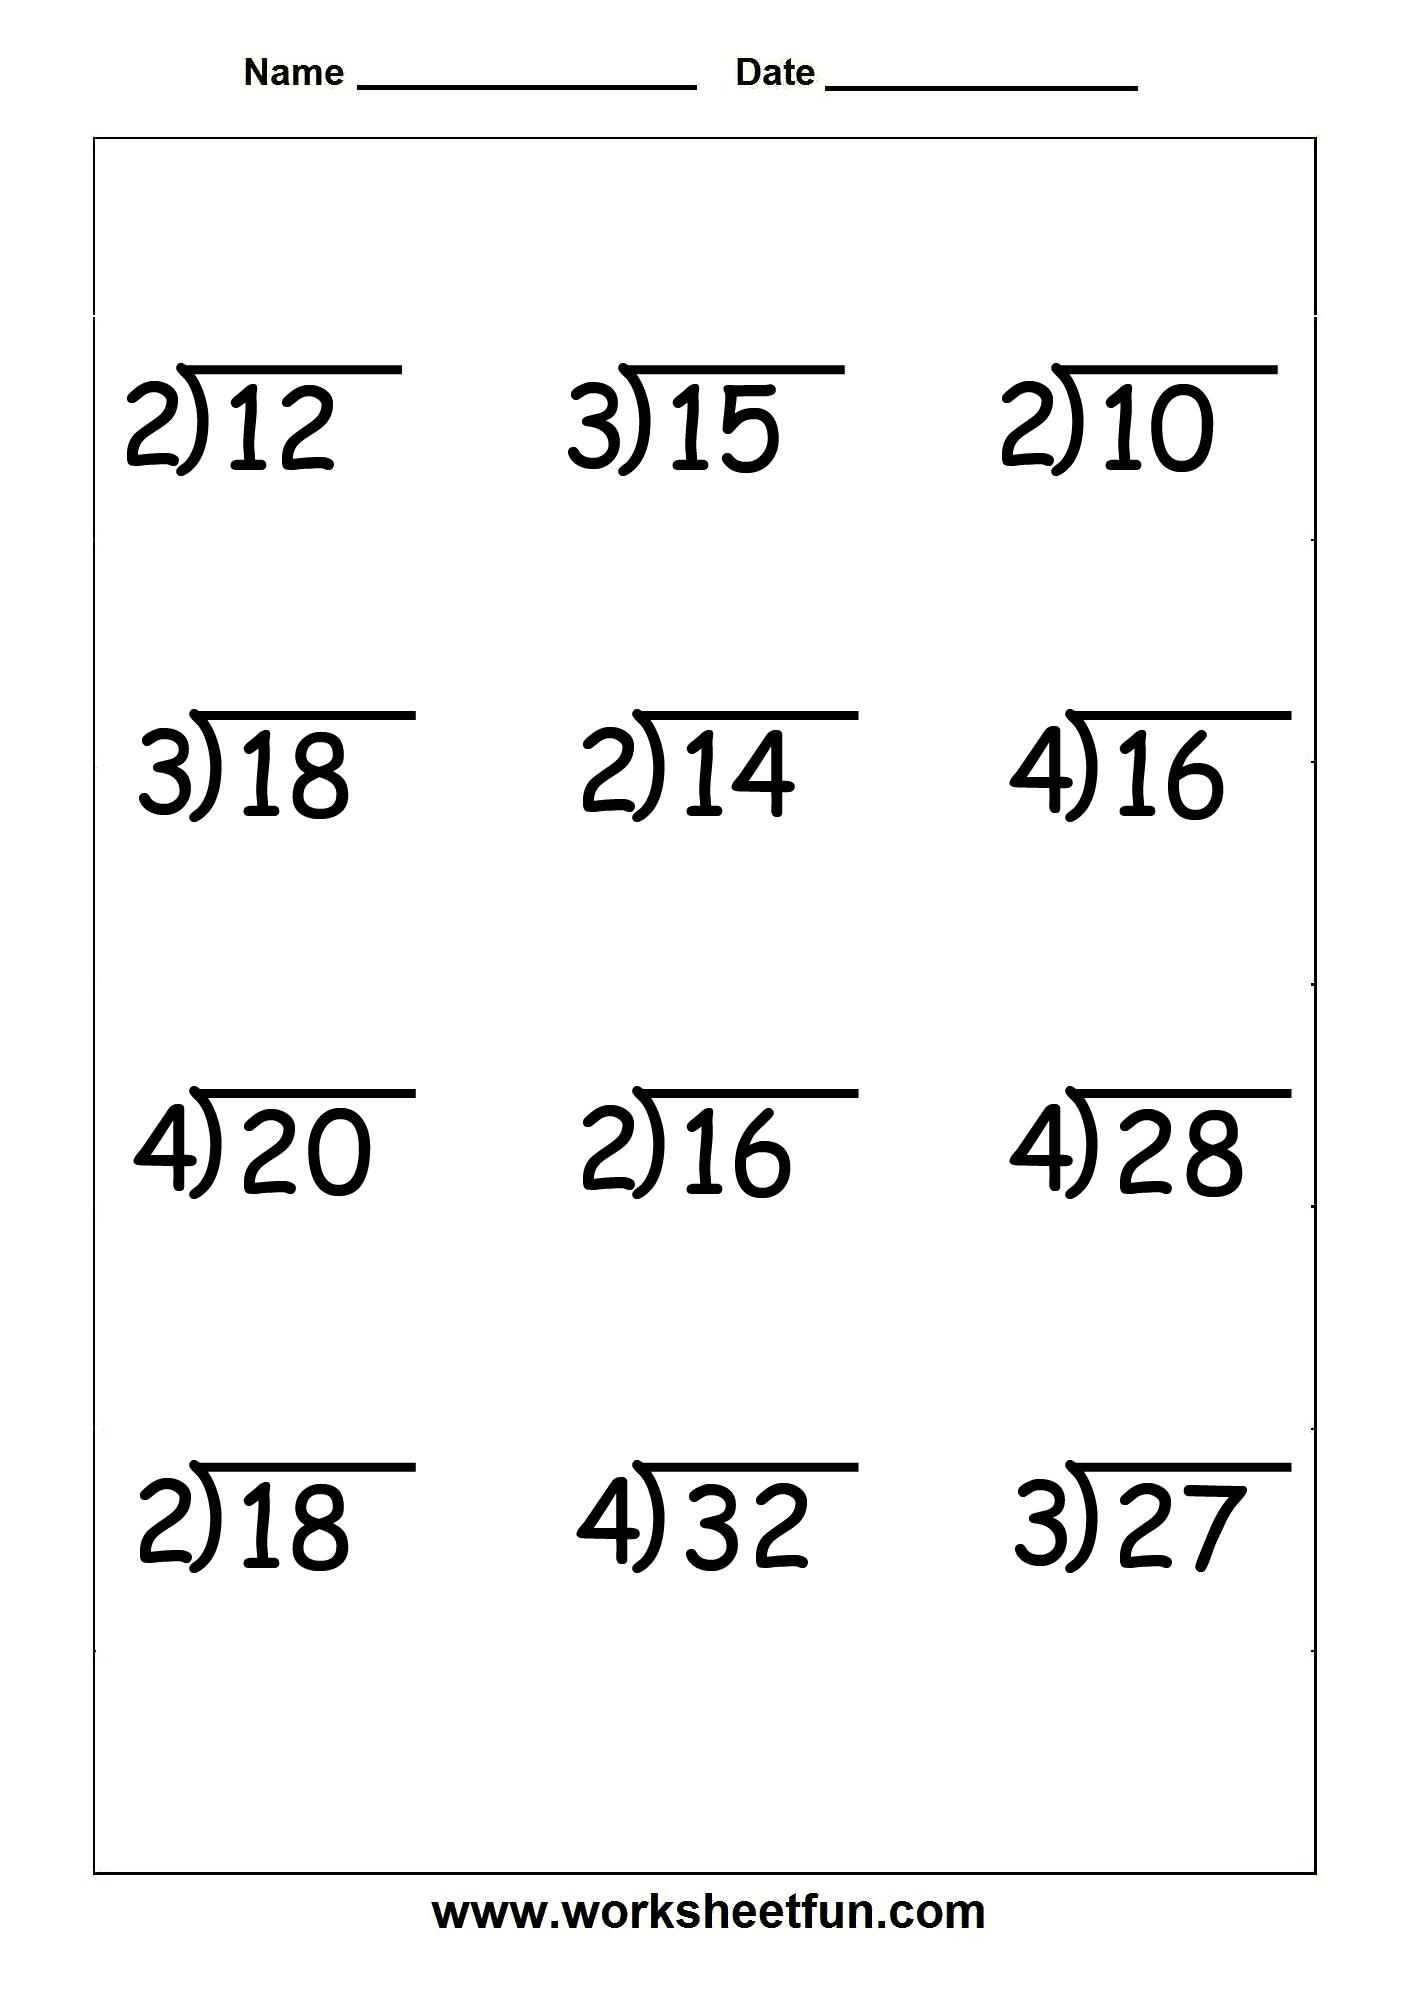 Division - 9 Worksheets | Printable Worksheets | 3Rd Grade Division - Free Printable Division Worksheets